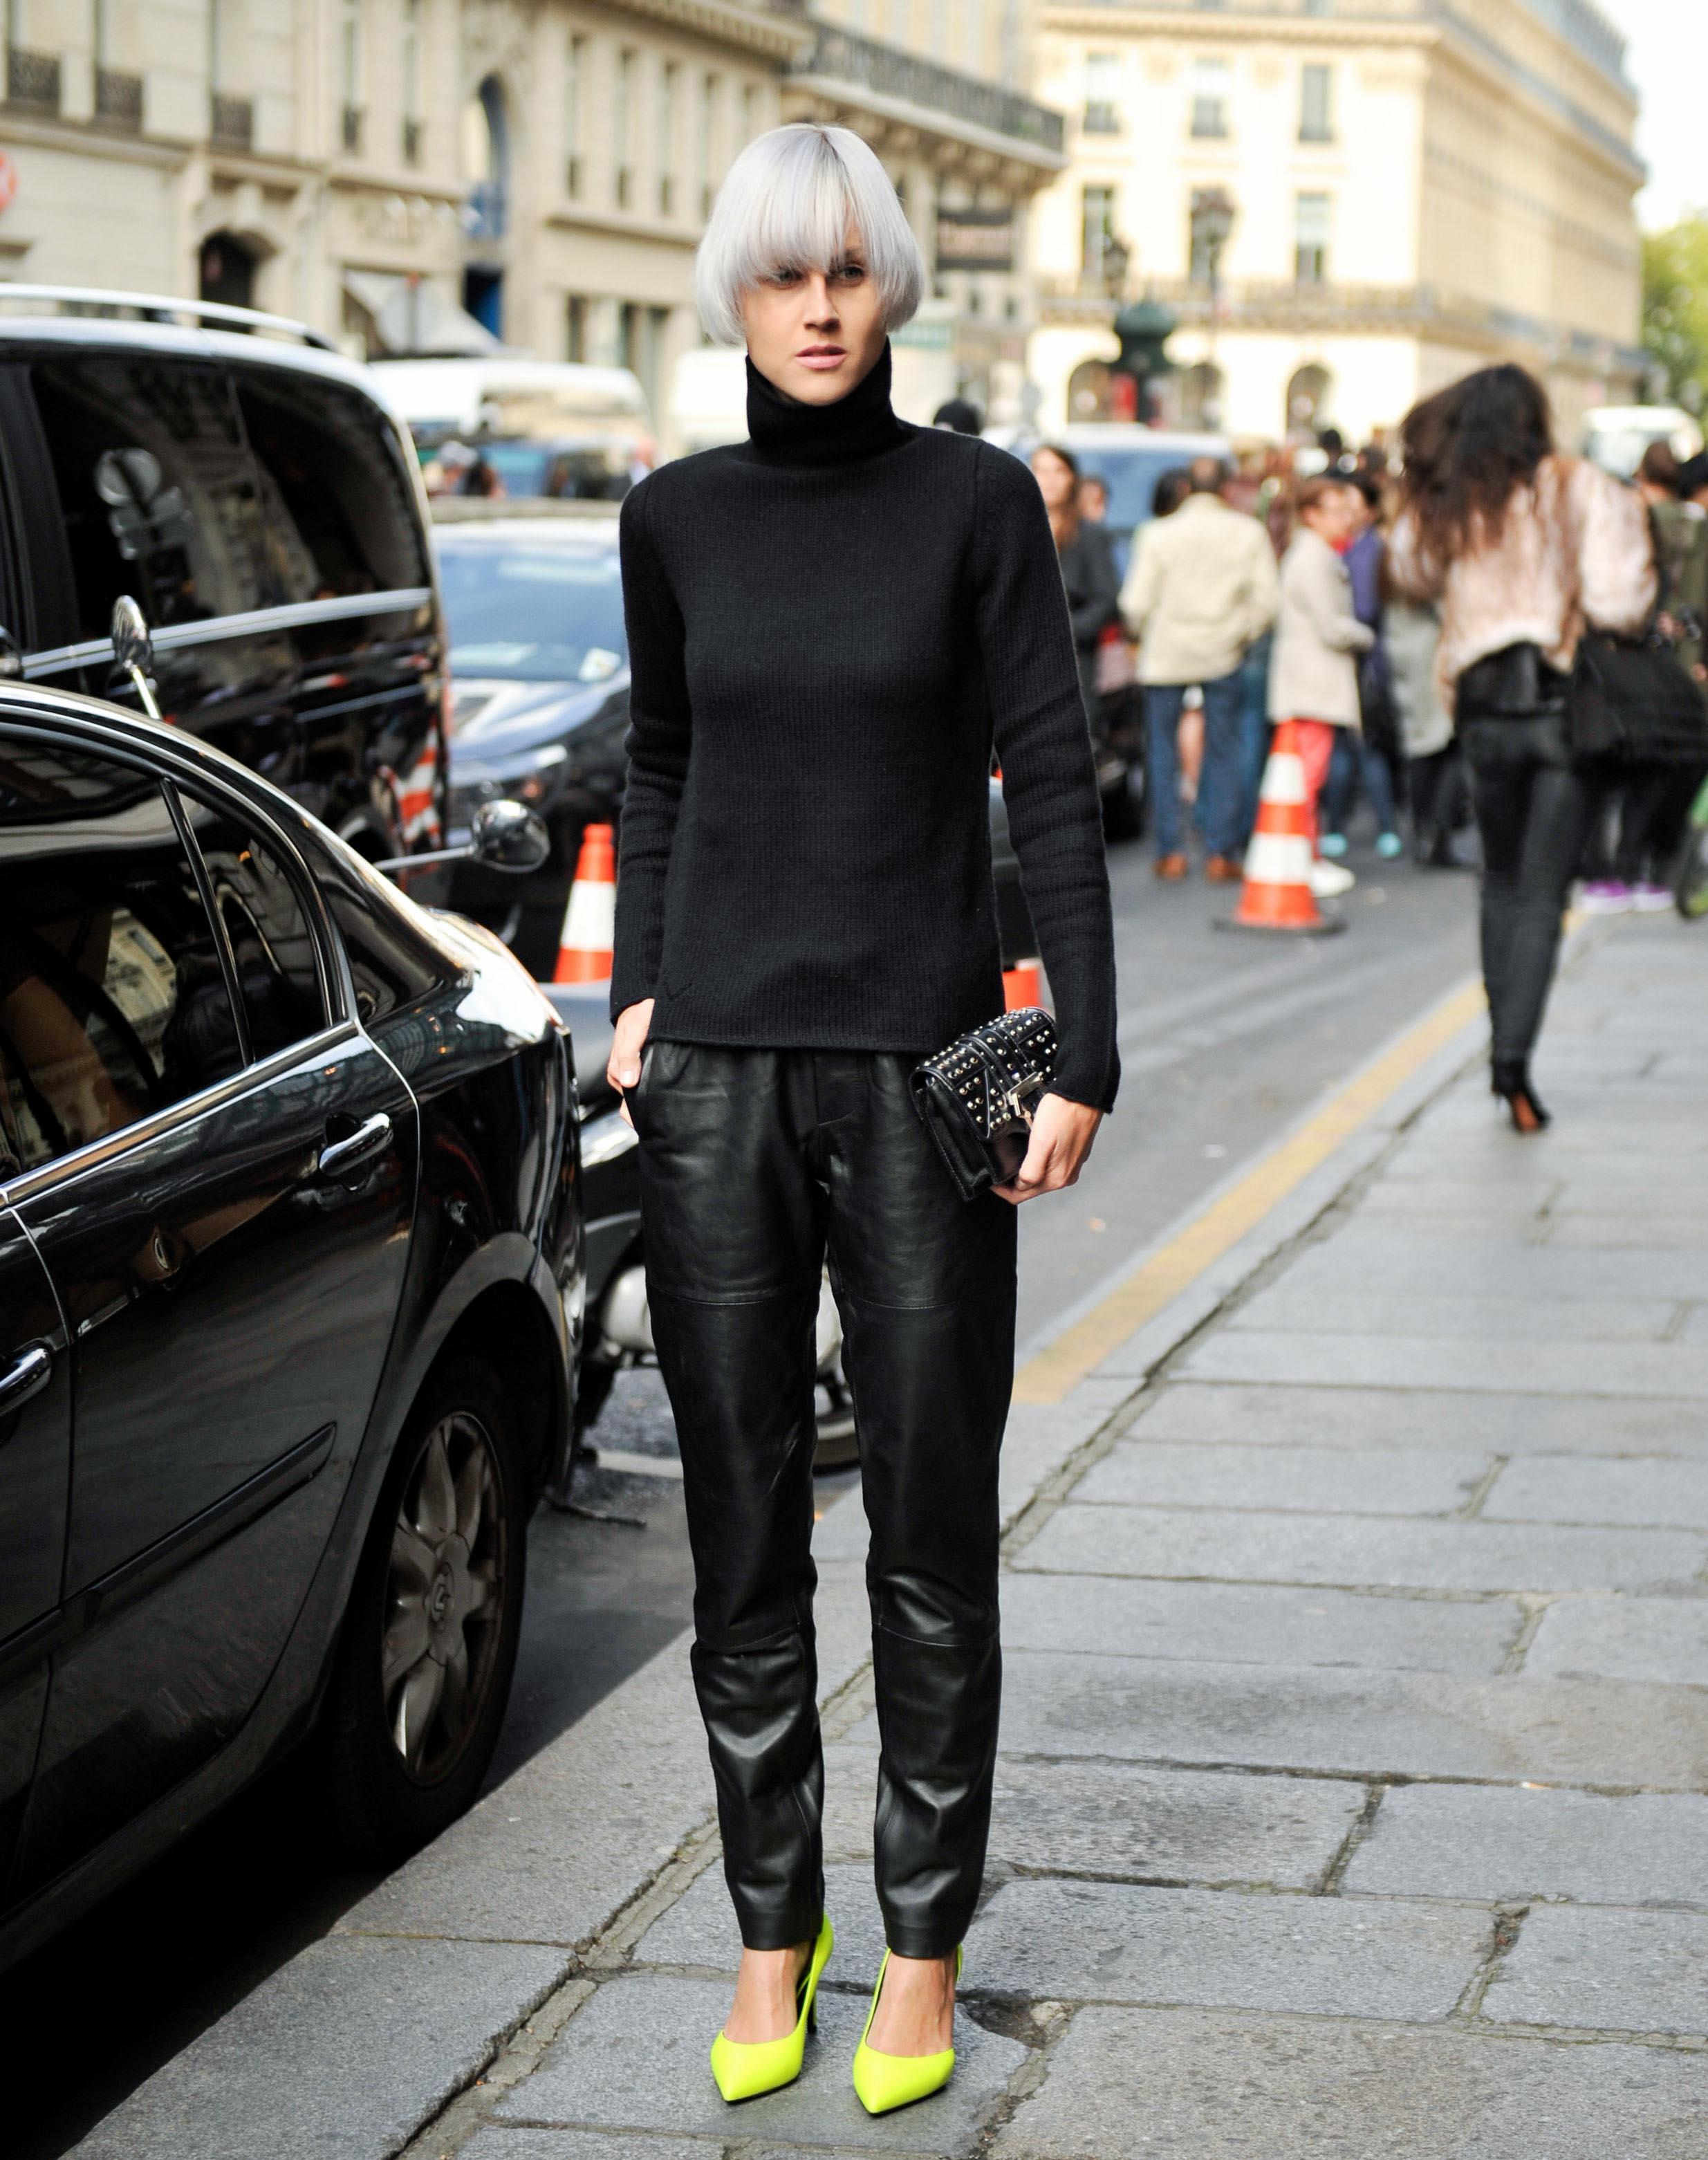 StreetStyle_ParisFashionWeek_LeandroJusten_061.jpg